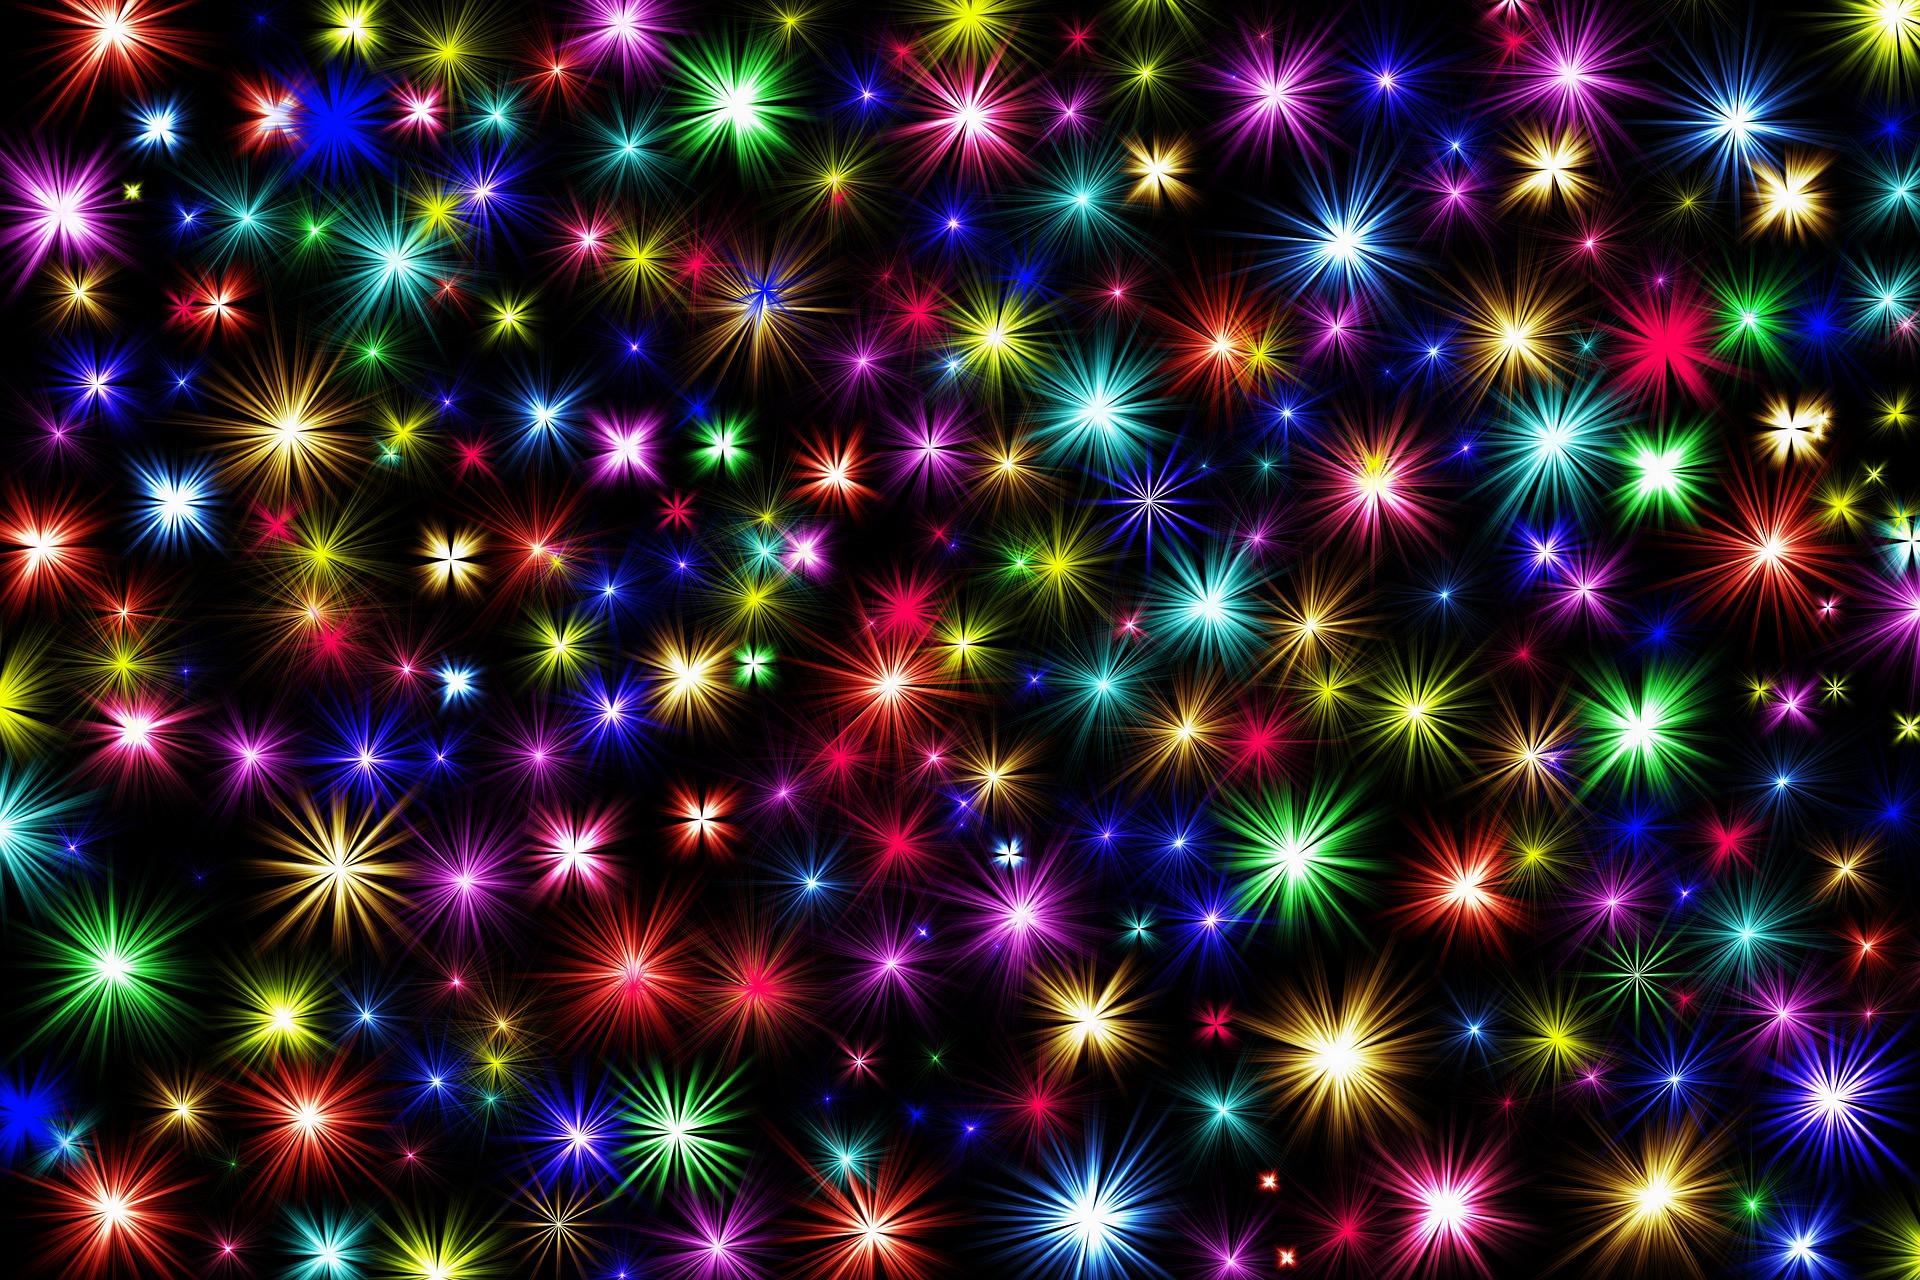 fireworks-2731708_1920